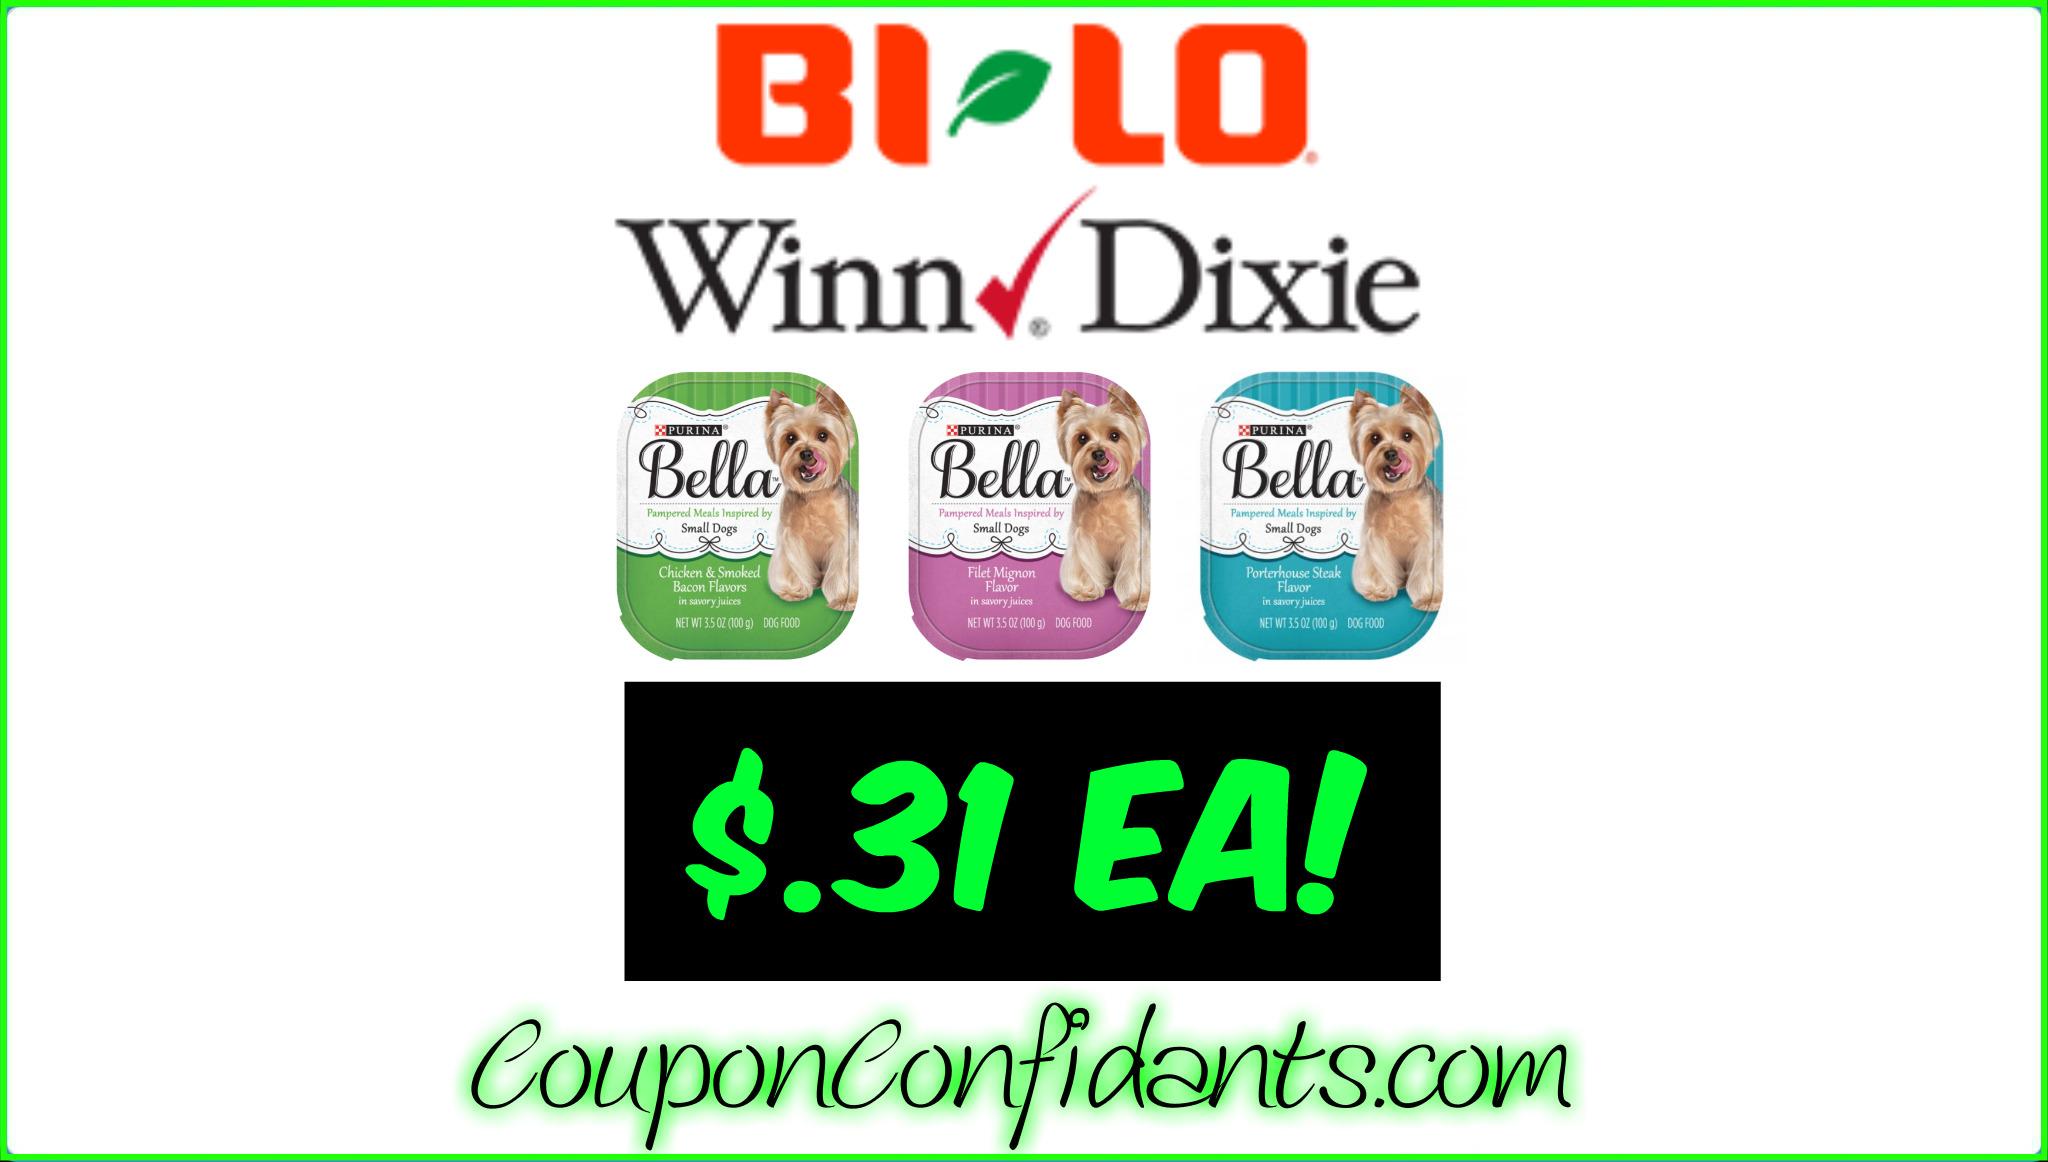 Stock up price on Bella Dog Food! Winn Dixie & Bi-lo